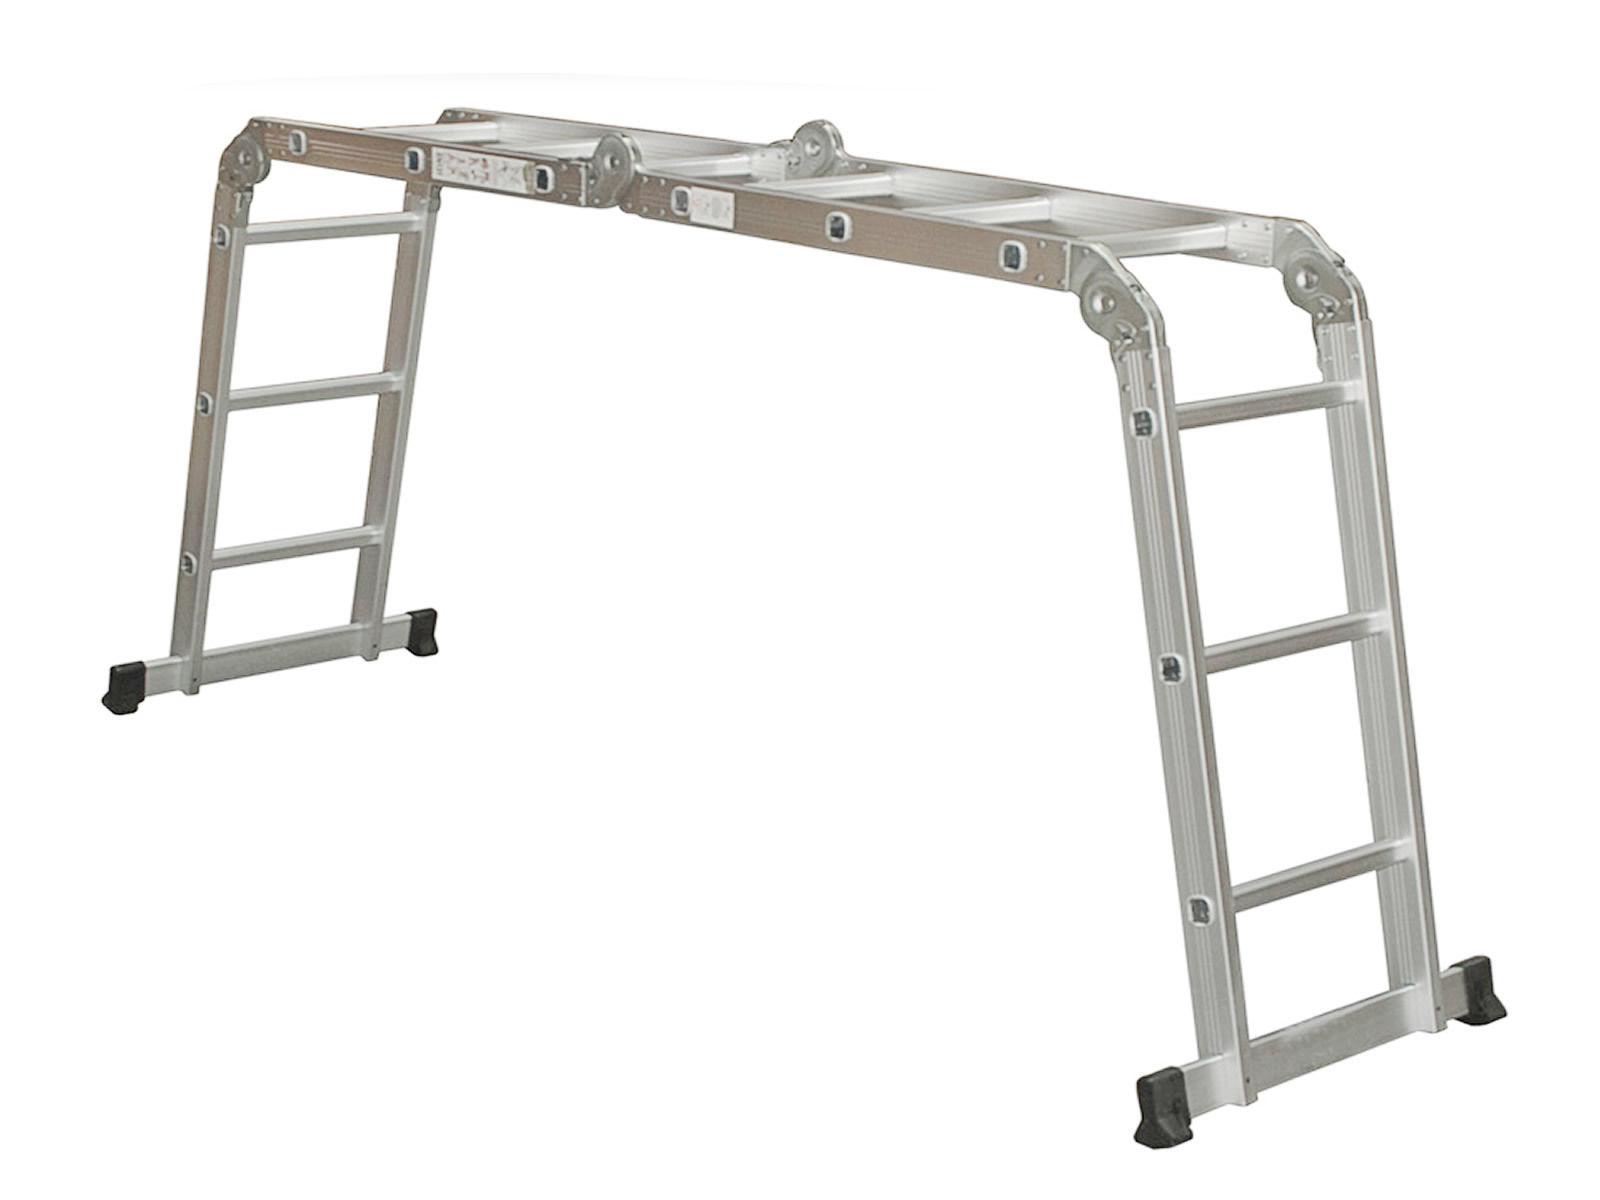 Folding Extension Ladder : Ft multi purpose aluminum folding step ladder scaffold